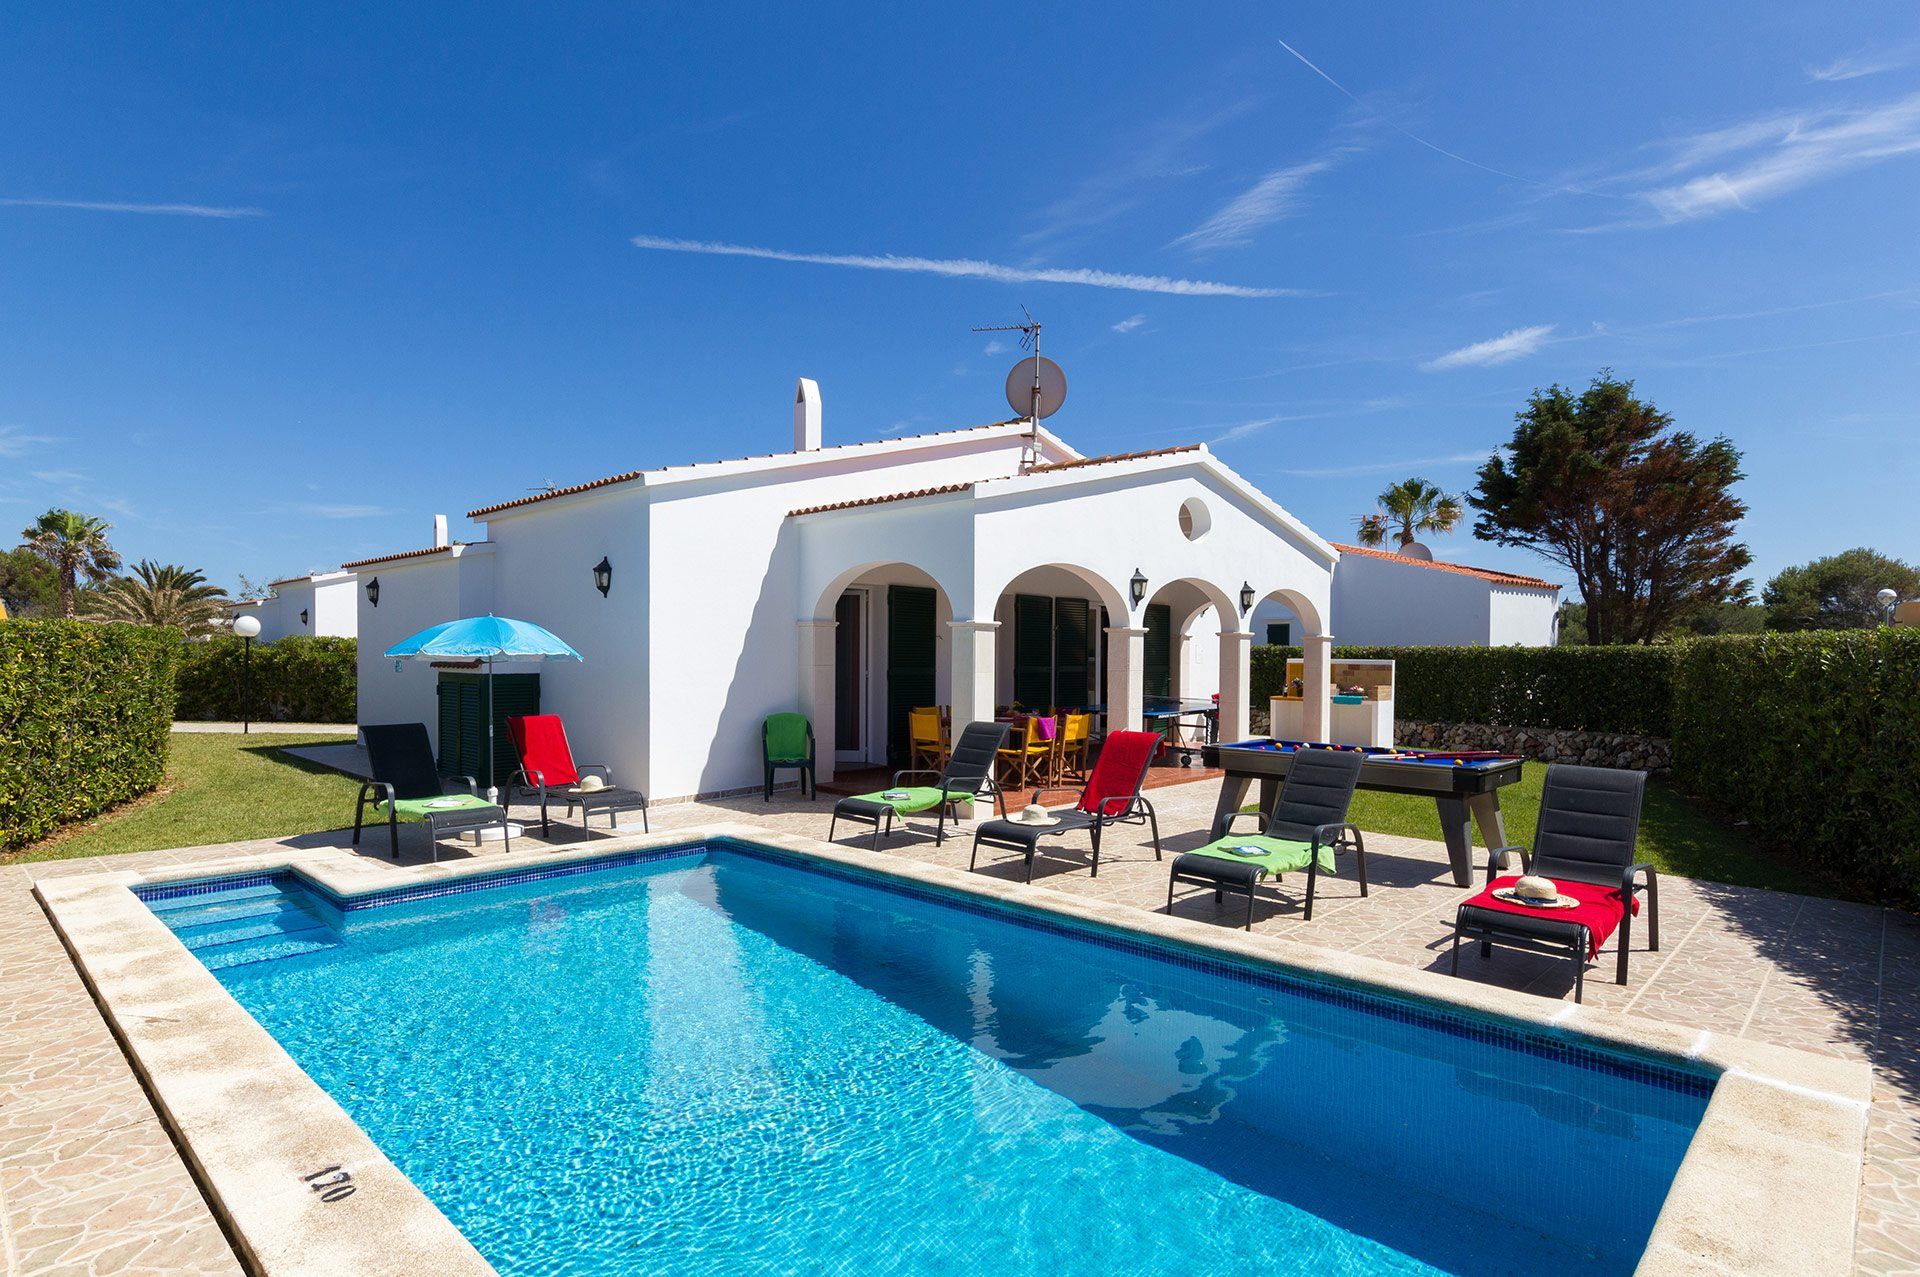 Villa Avellano, Calan Bosch, Menorca, Spain